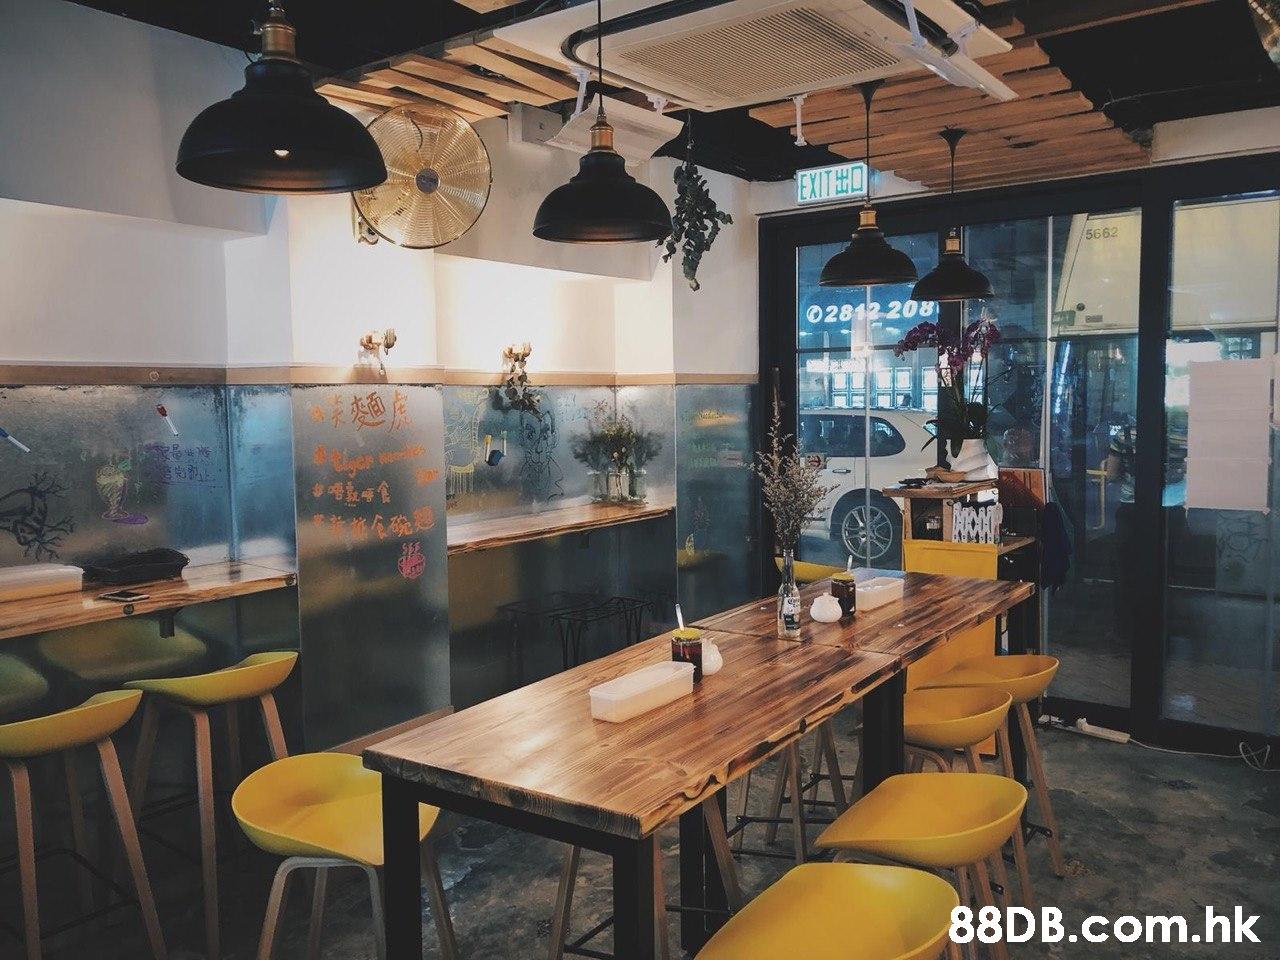 EXIT HD 5662 02812 208 .hk  Building,Room,Table,Furniture,Interior design